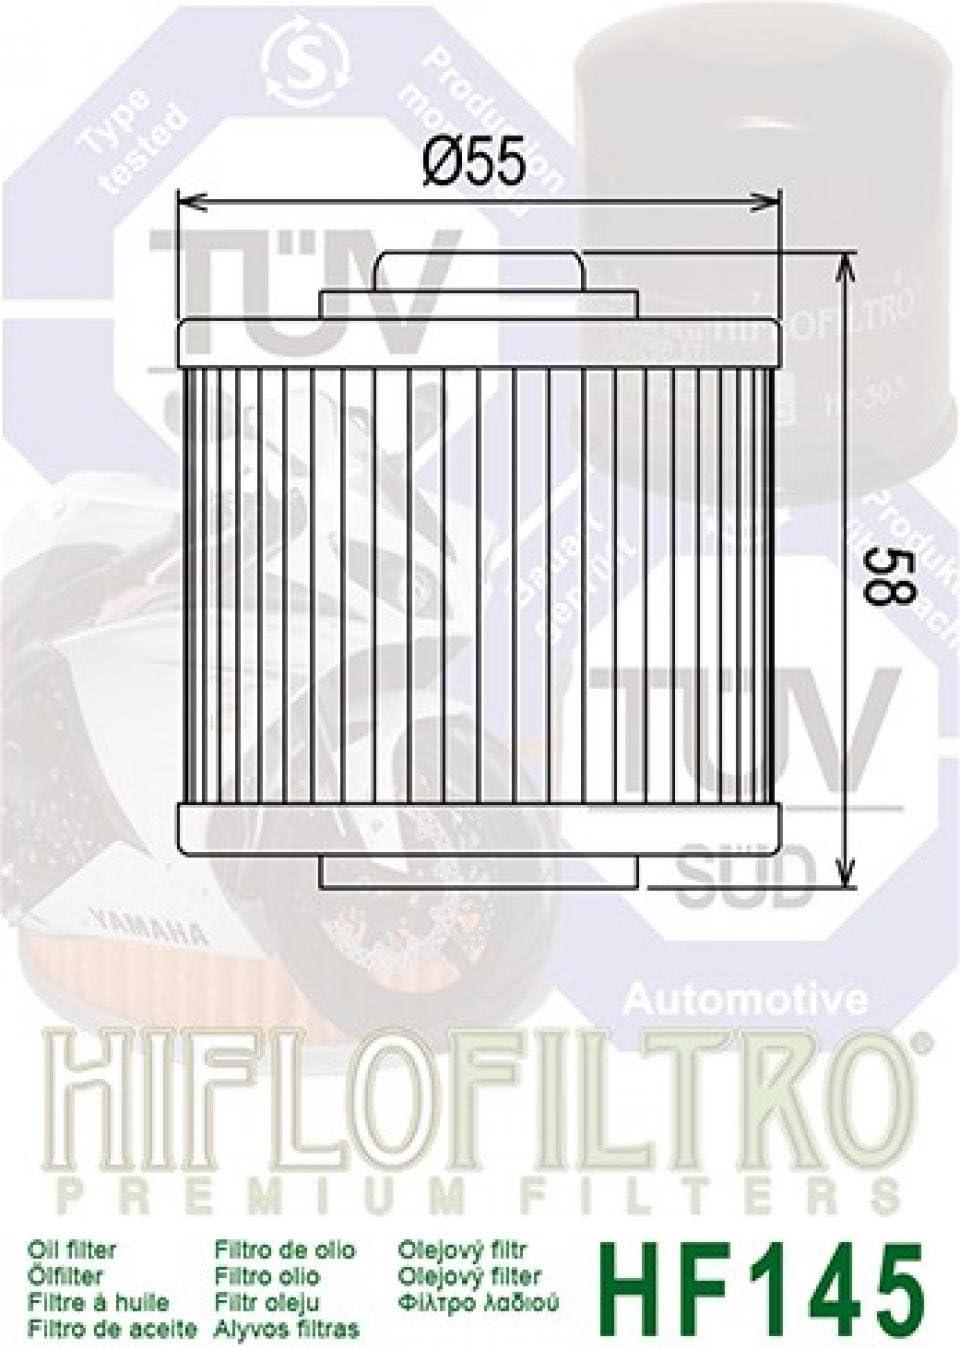 Filtro olio Hiflo per moto Yamaha 750 Xtz Super Tenere 1989-1998